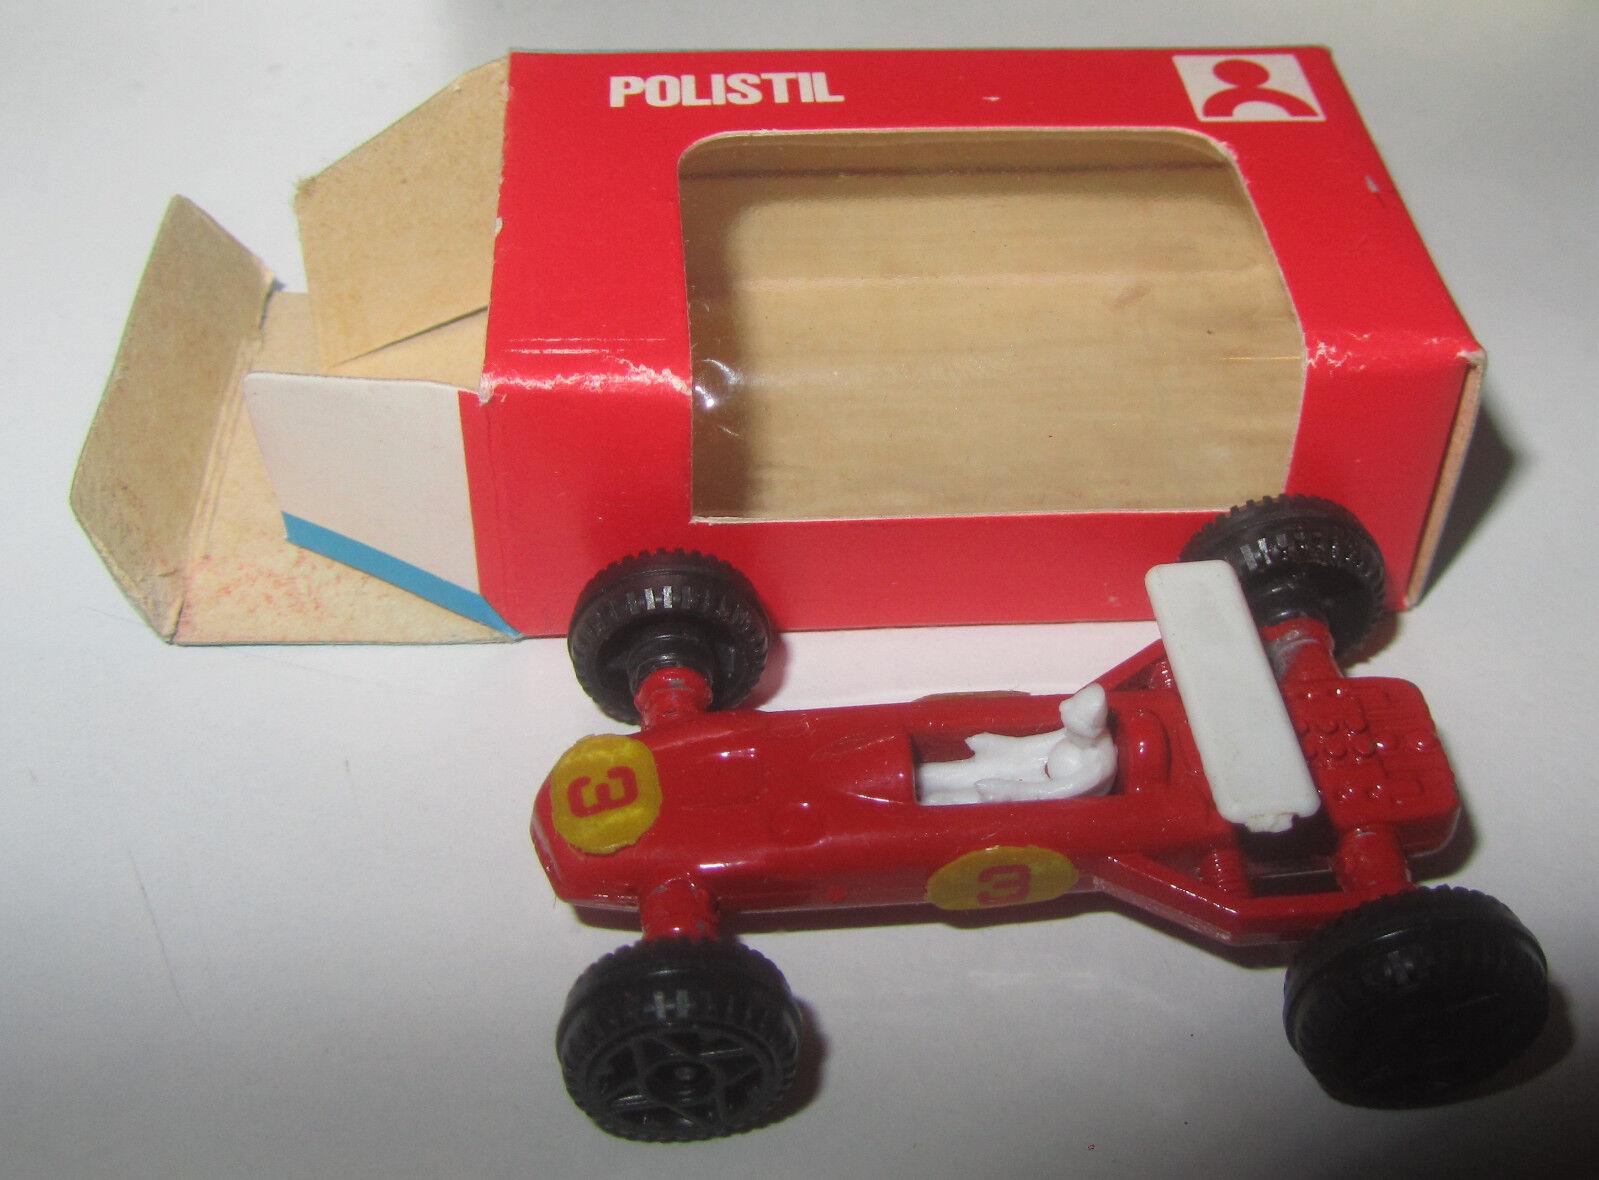 POLISTIL EAGLE WESLAK F.1 N°0/62 Rossa OMAGGIO DEL GESTORE BENZINA BP ANNO 1968